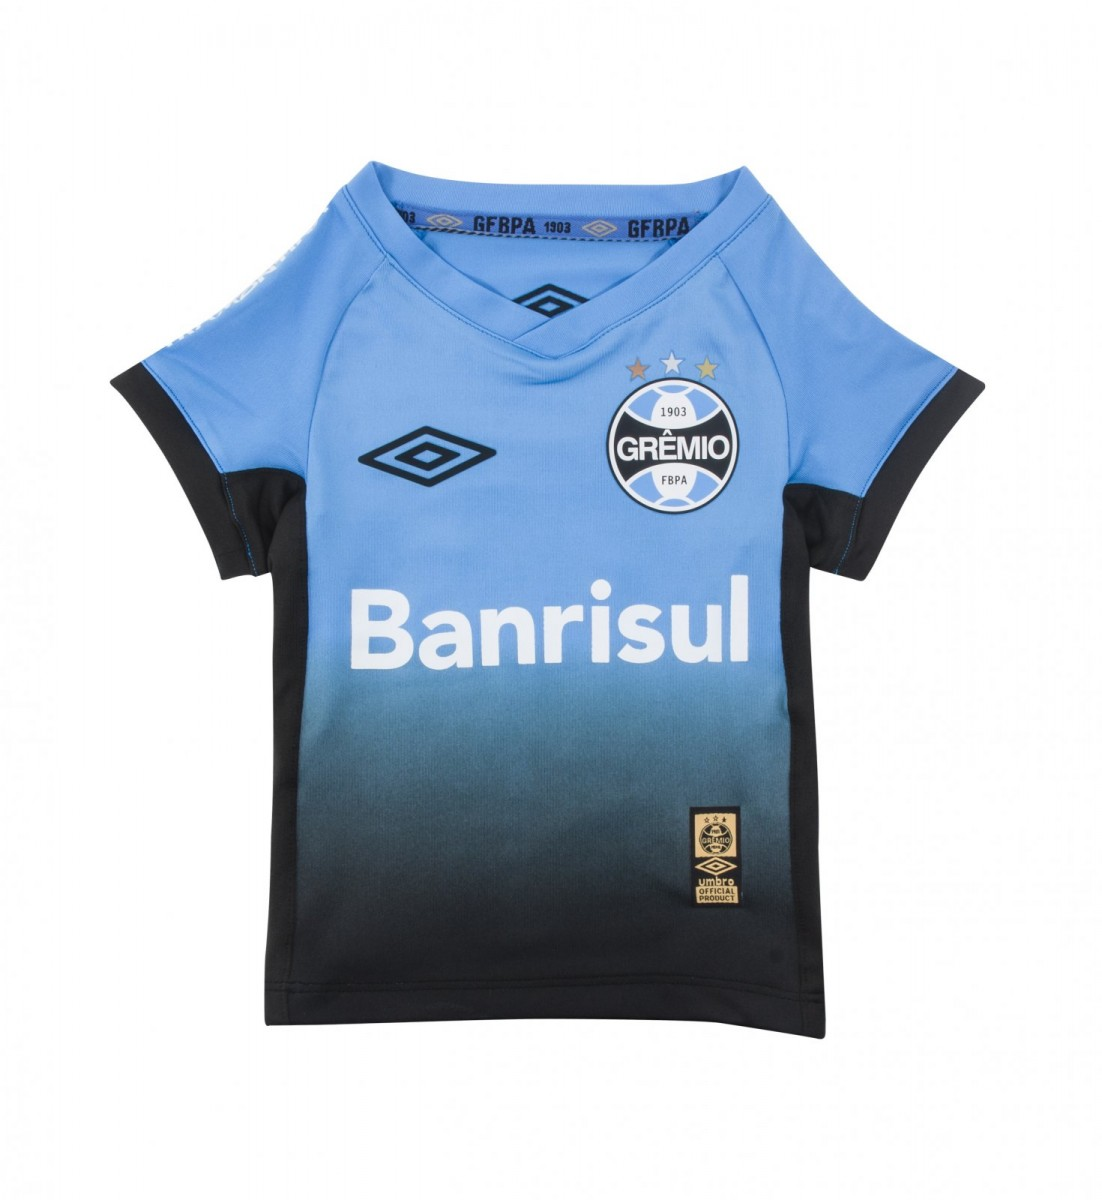 85c68555f8 Bizz Store - Camisa Oficial Infantil Umbro Grêmio Of 3 2015 Menino